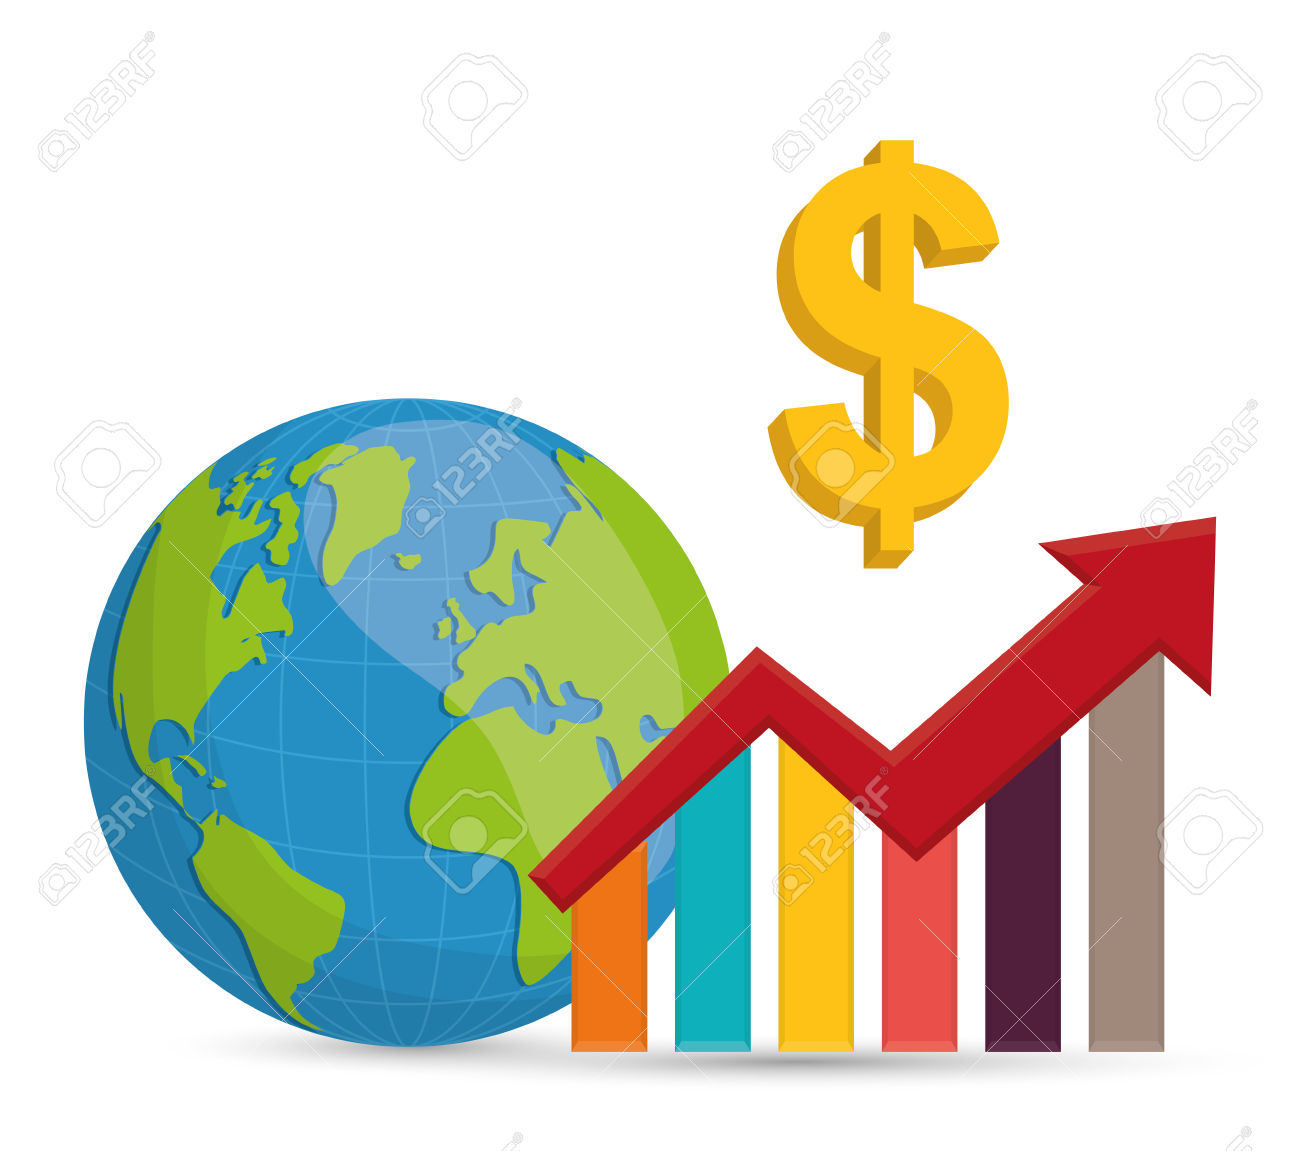 Cash clipart economics.  collection of global